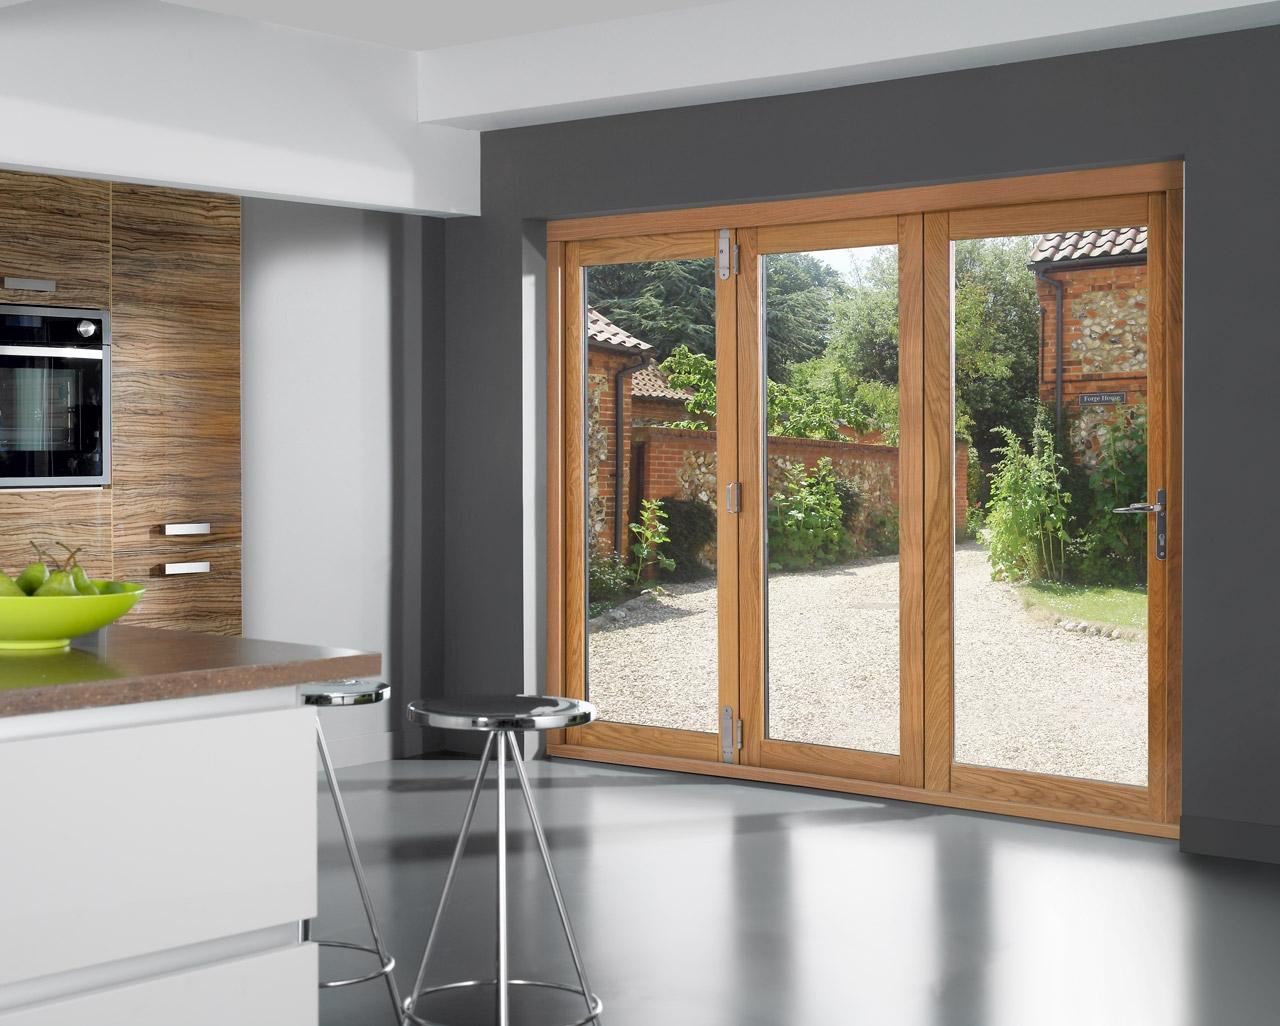 9 foot sliding glass patio doors